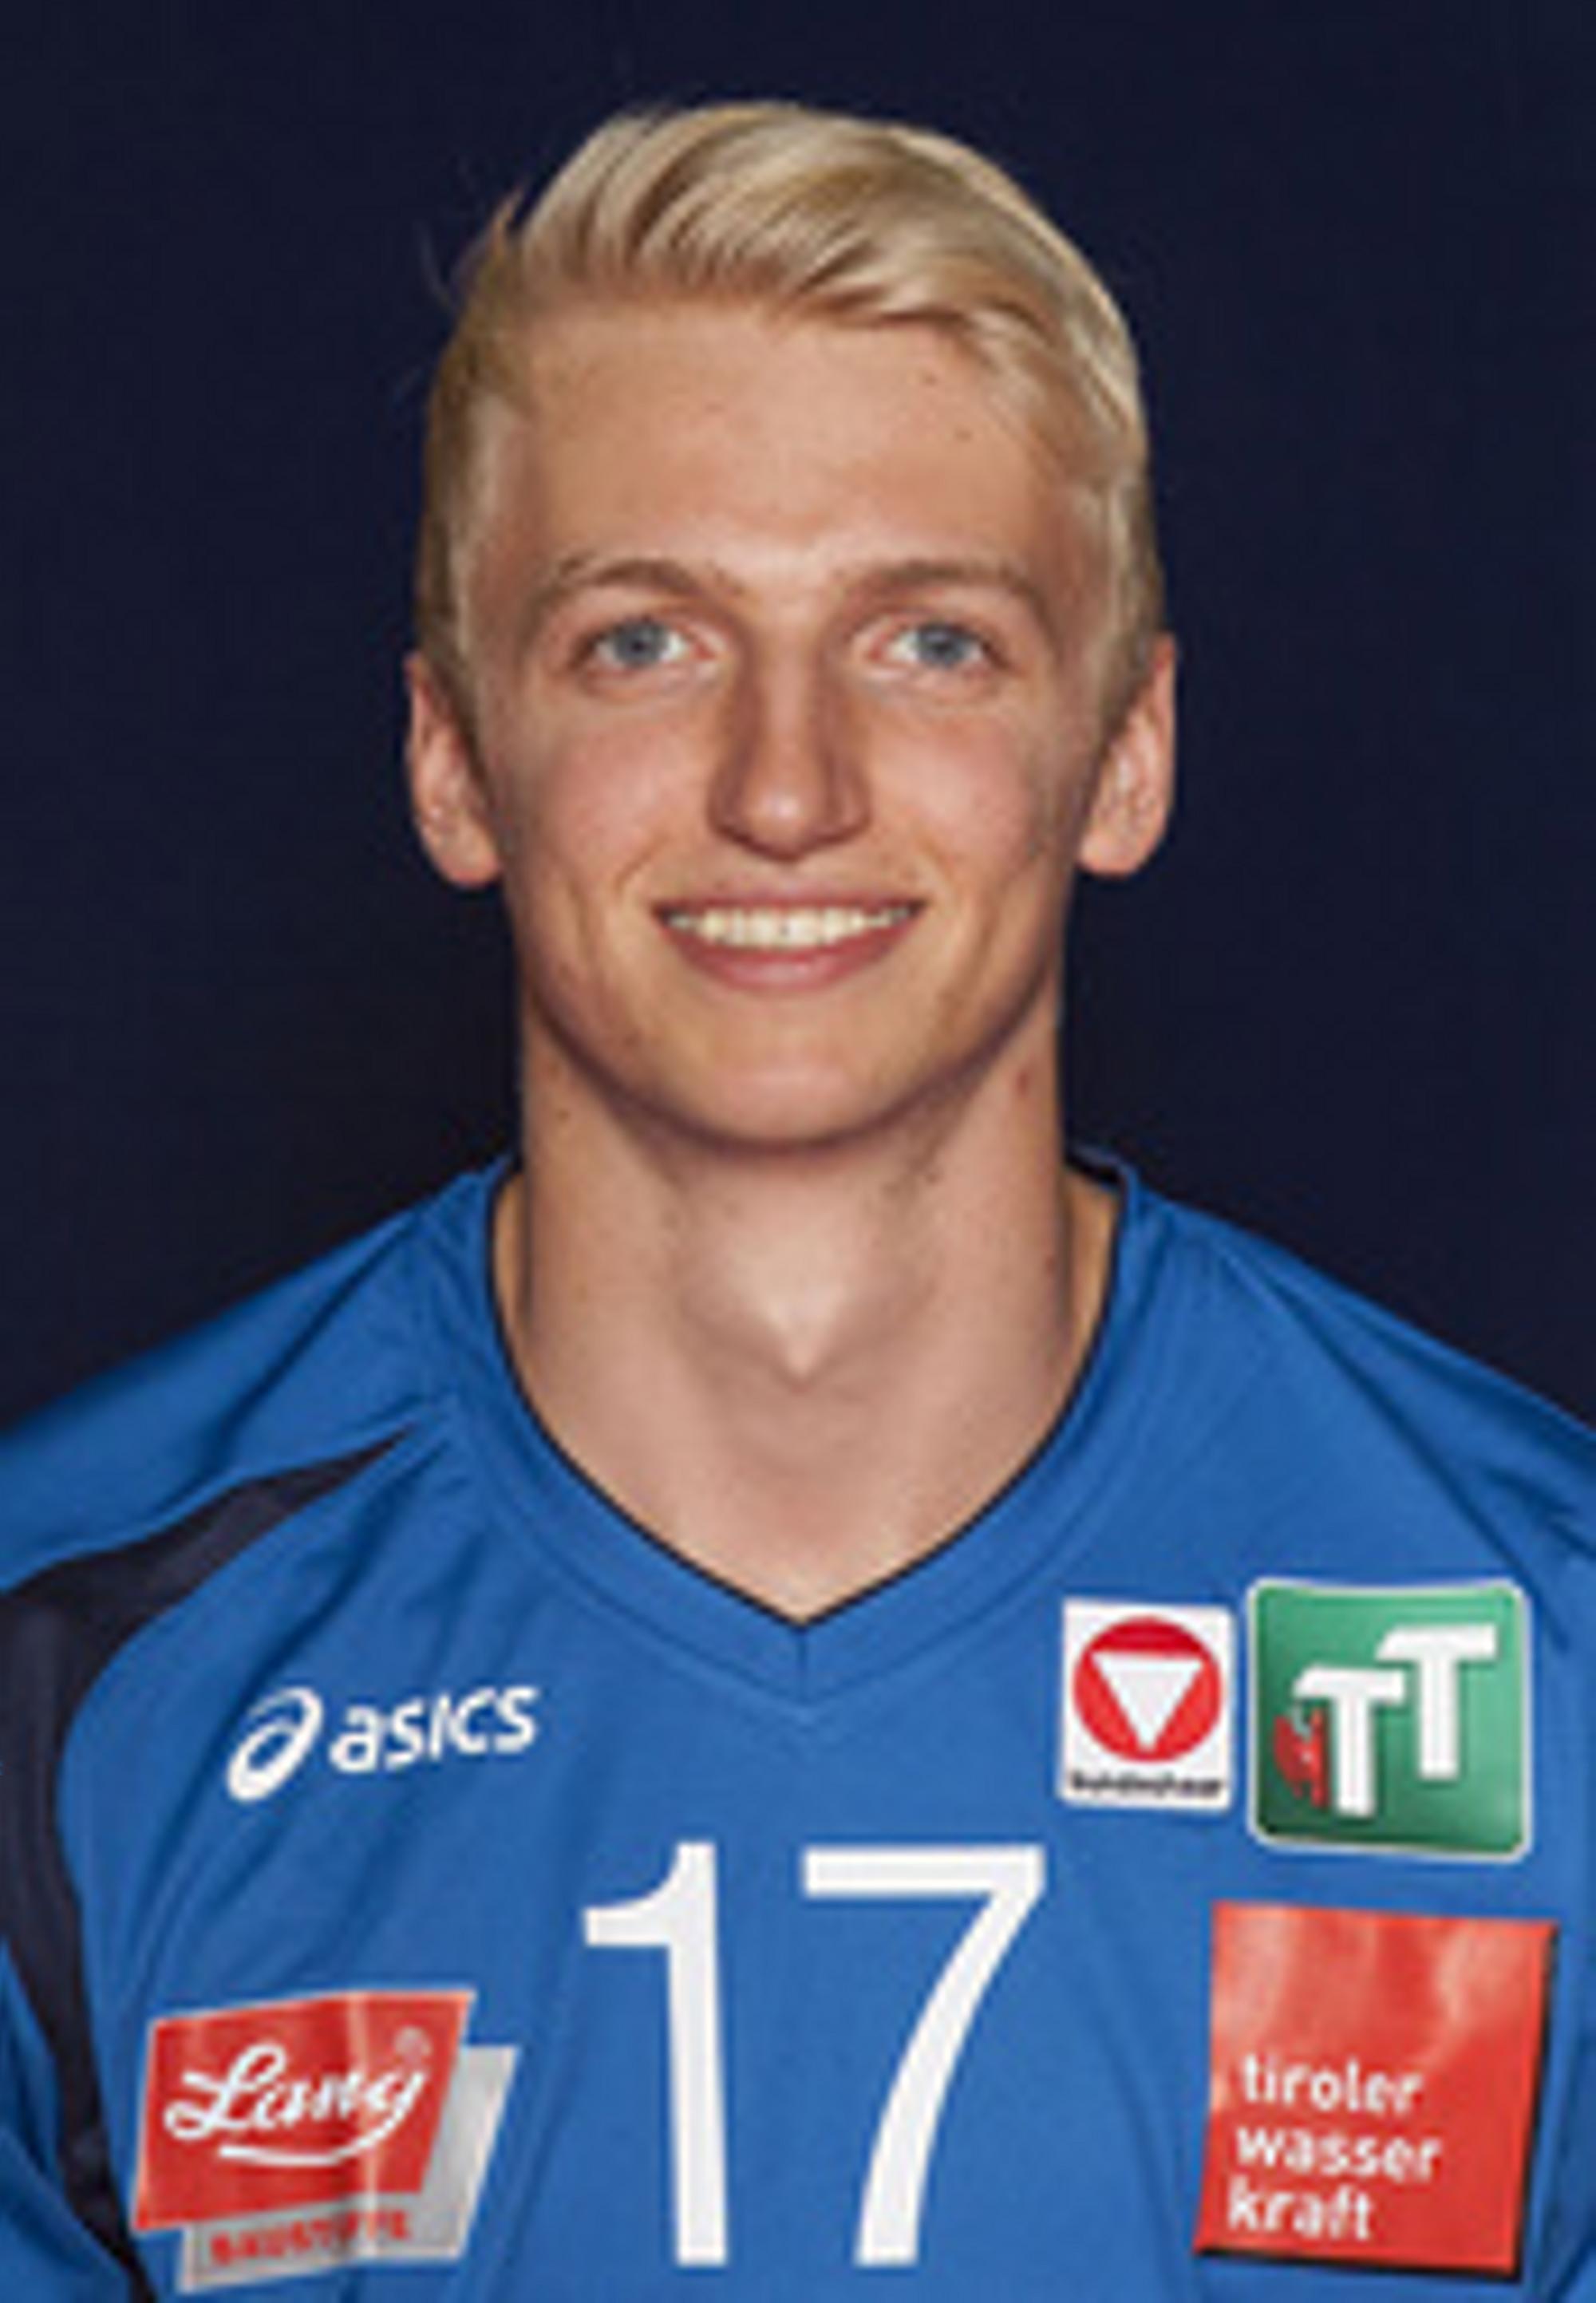 Alexander Harthaller